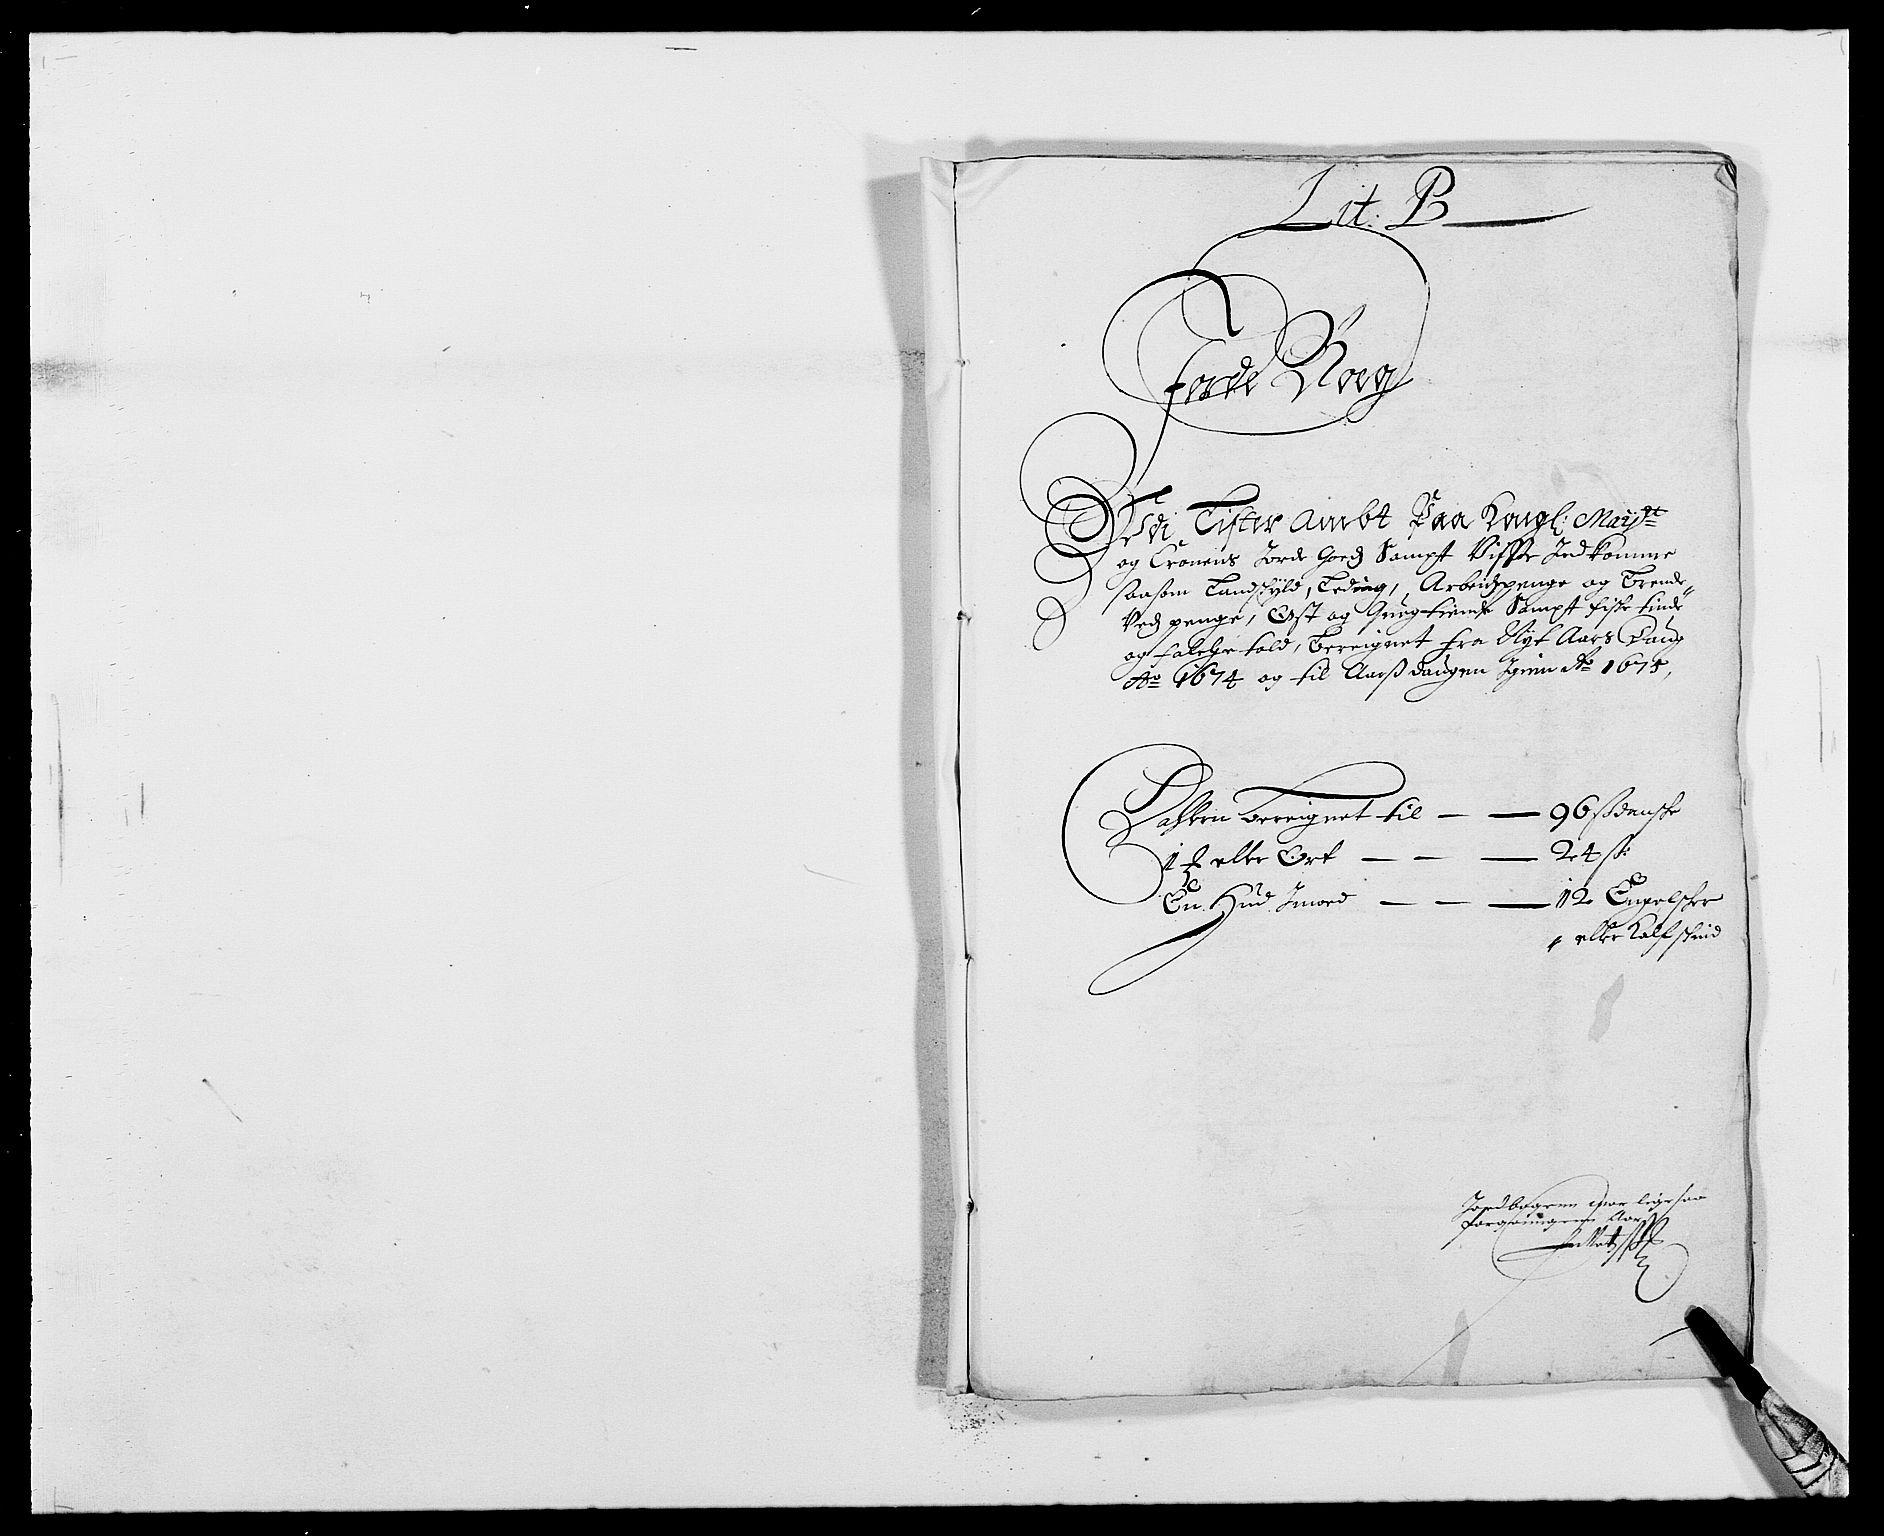 RA, Rentekammeret inntil 1814, Reviderte regnskaper, Fogderegnskap, R41/L2528: Fogderegnskap Lista, 1673-1674, s. 193